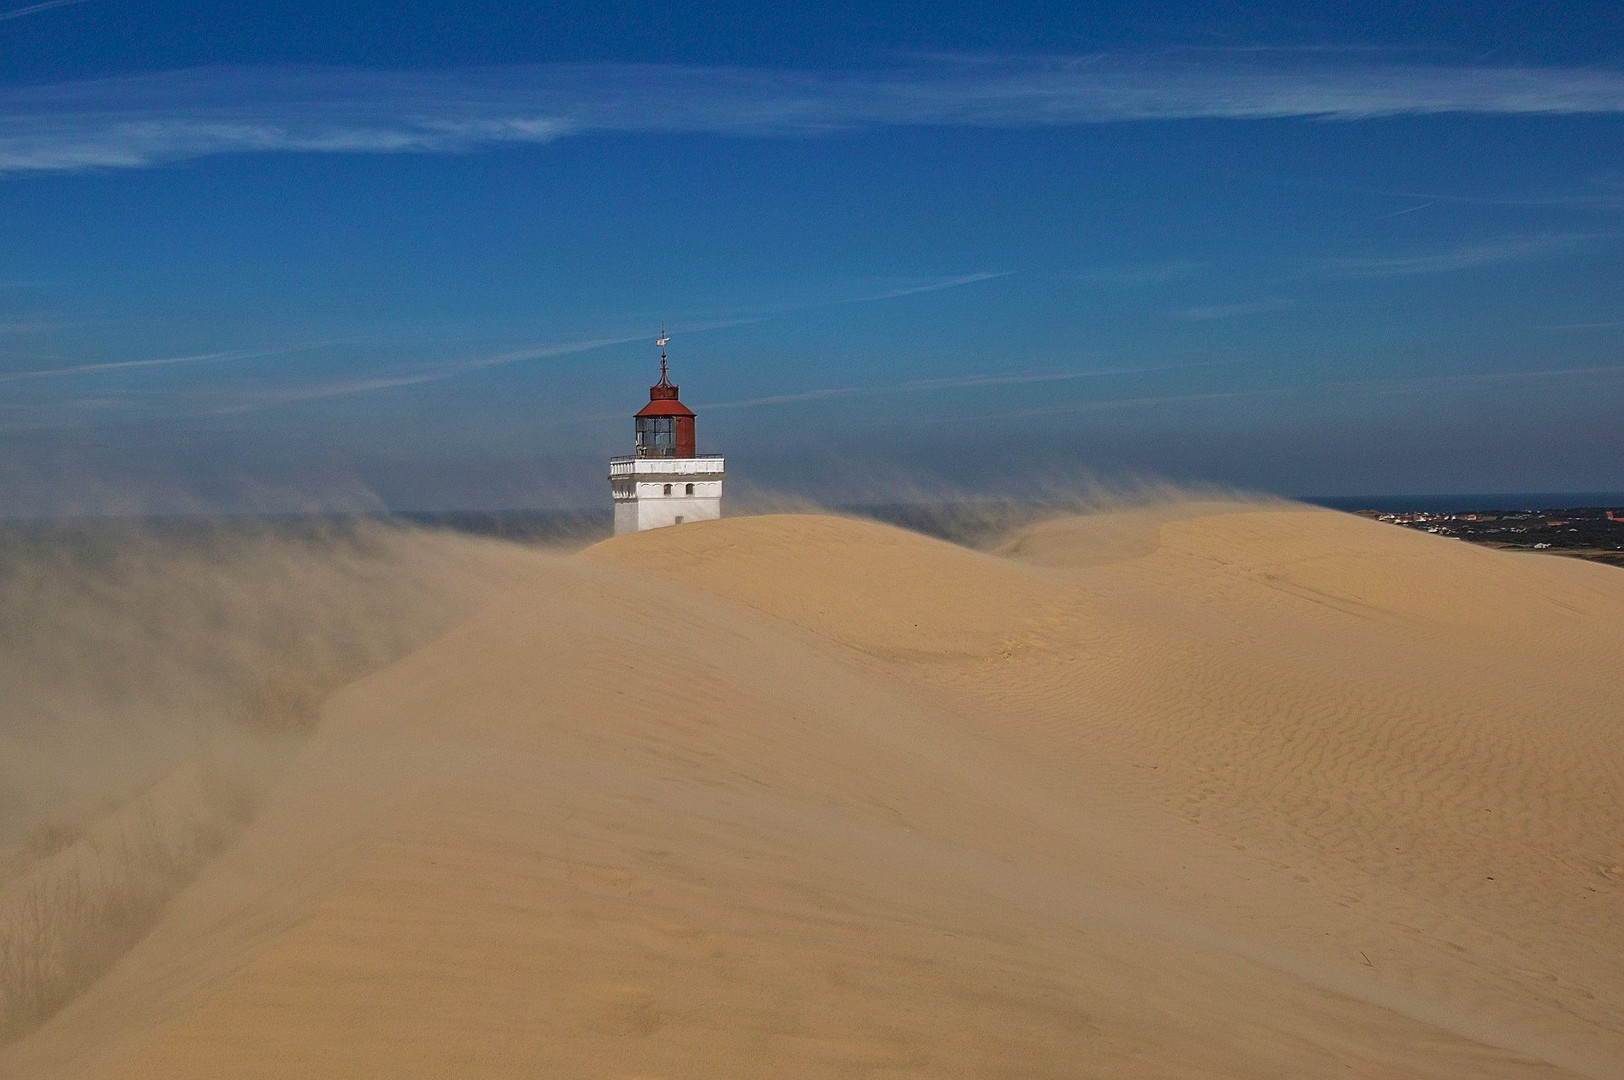 Der Leuchtturm Rubjerg Knude im Sandsturm